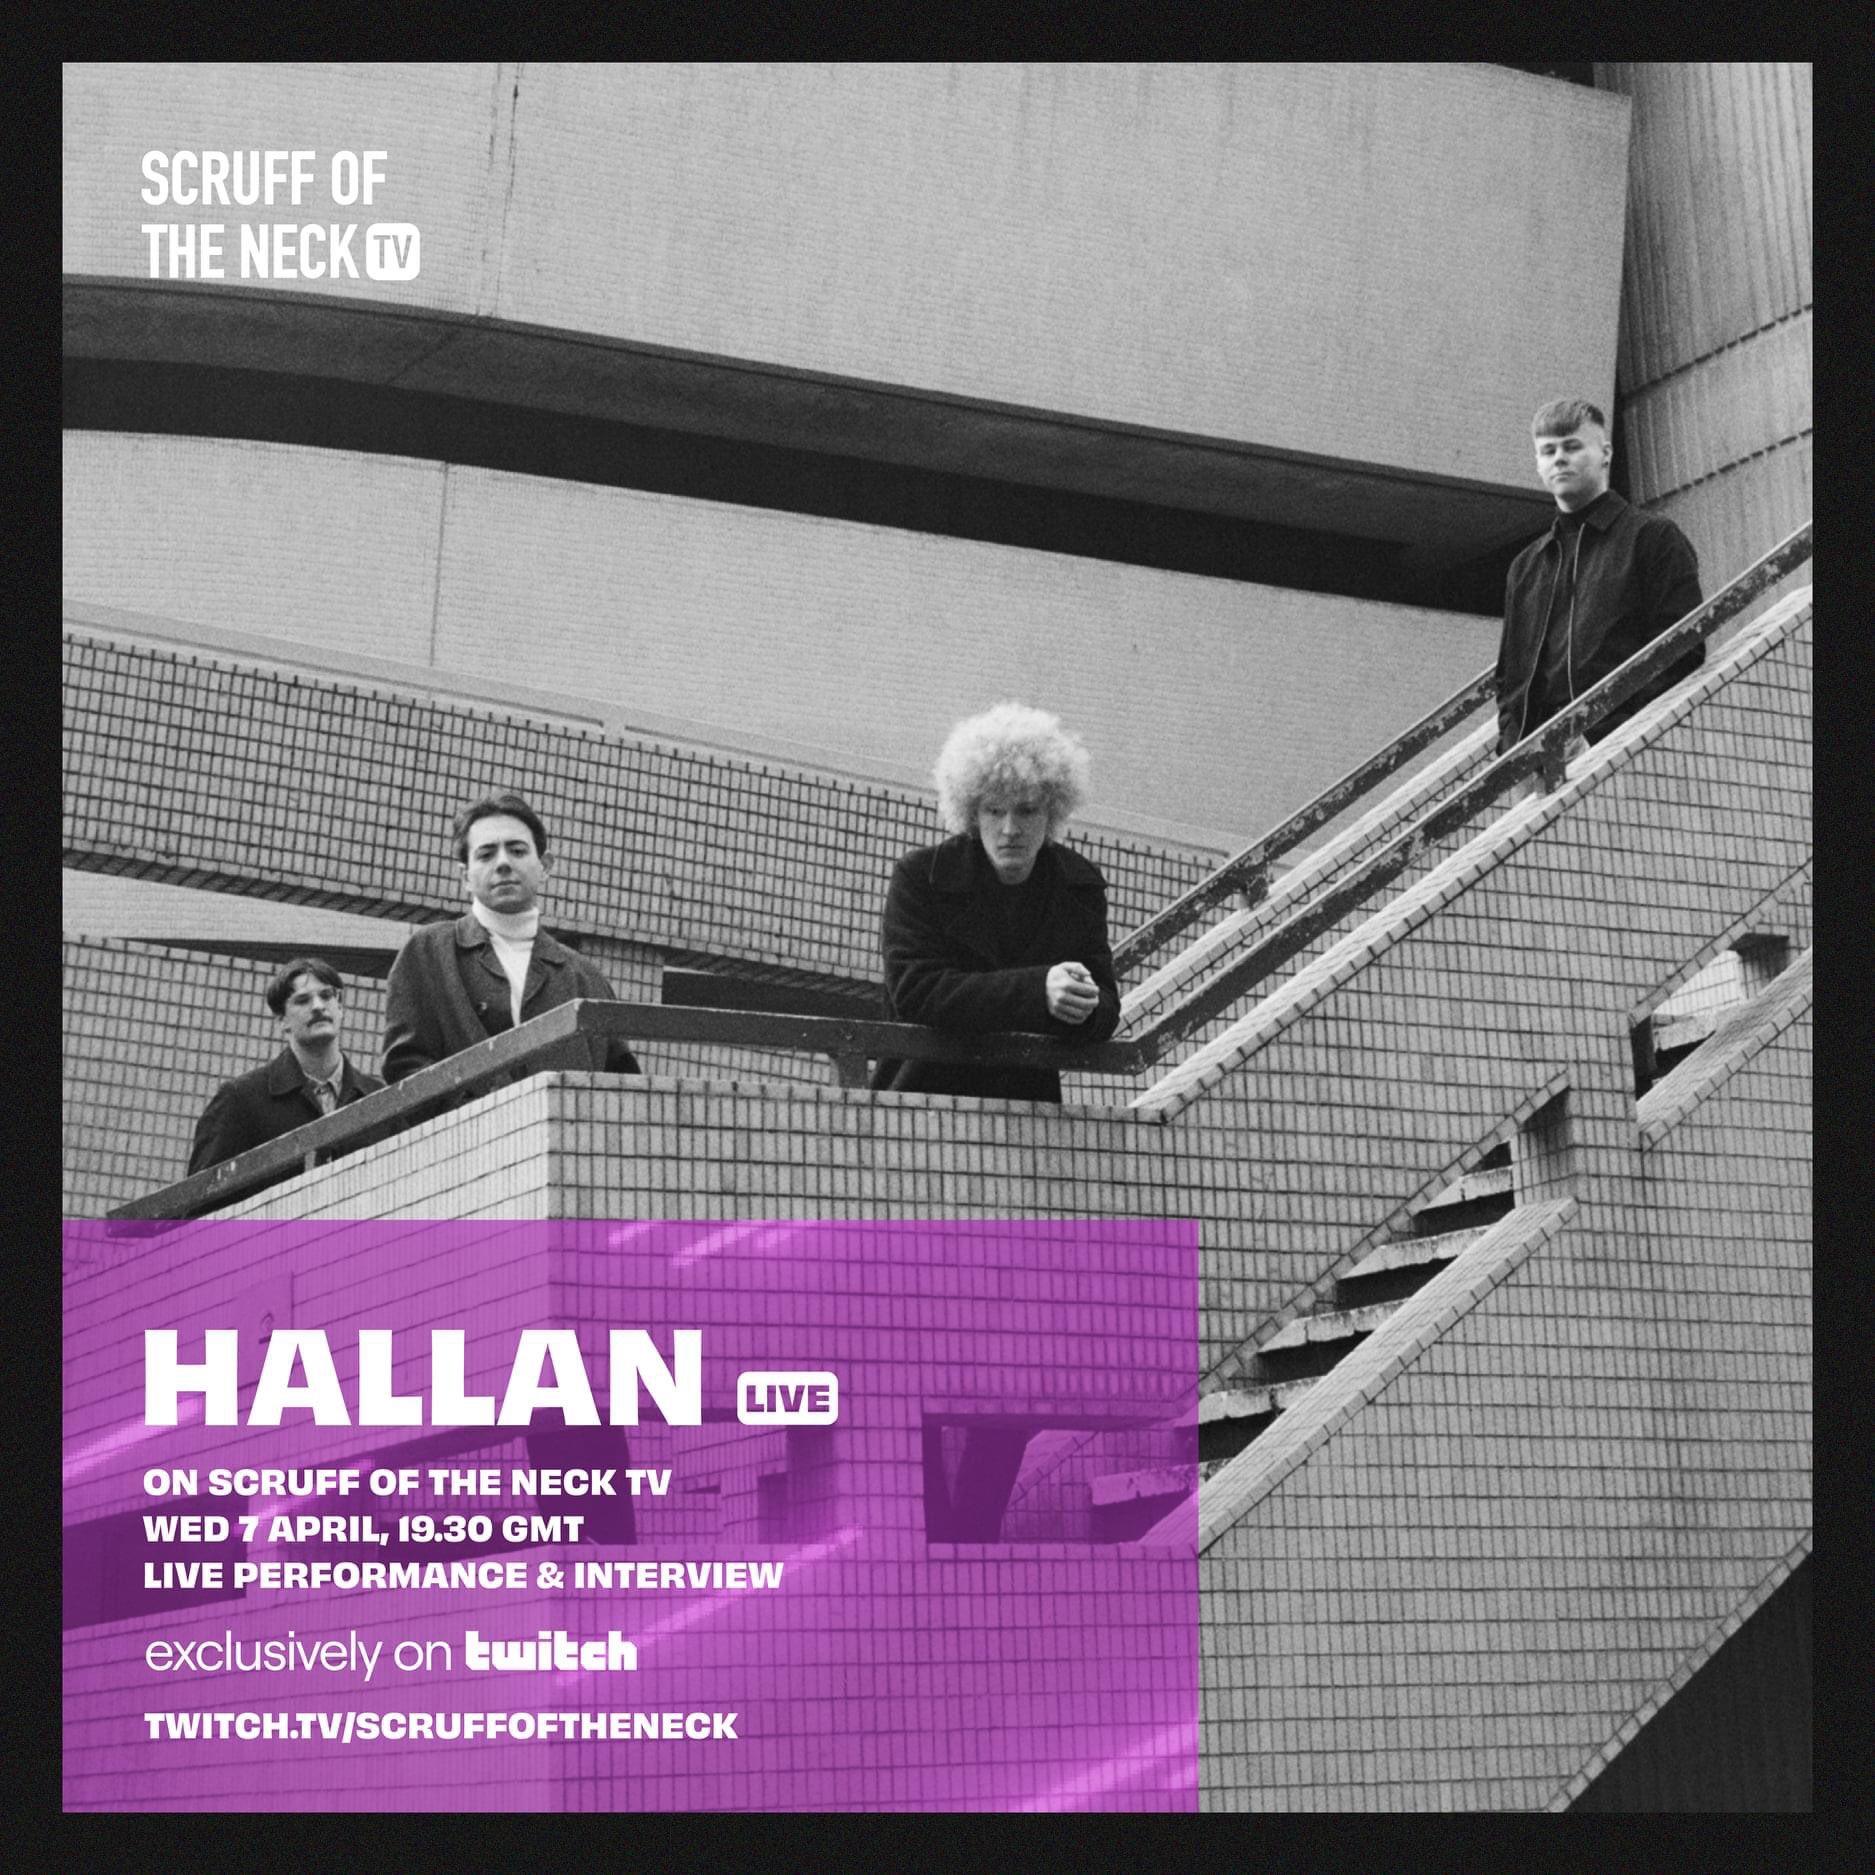 Le Live de la semaine – Hallan – Hands Up (Live on Scruff of the Neck TV)